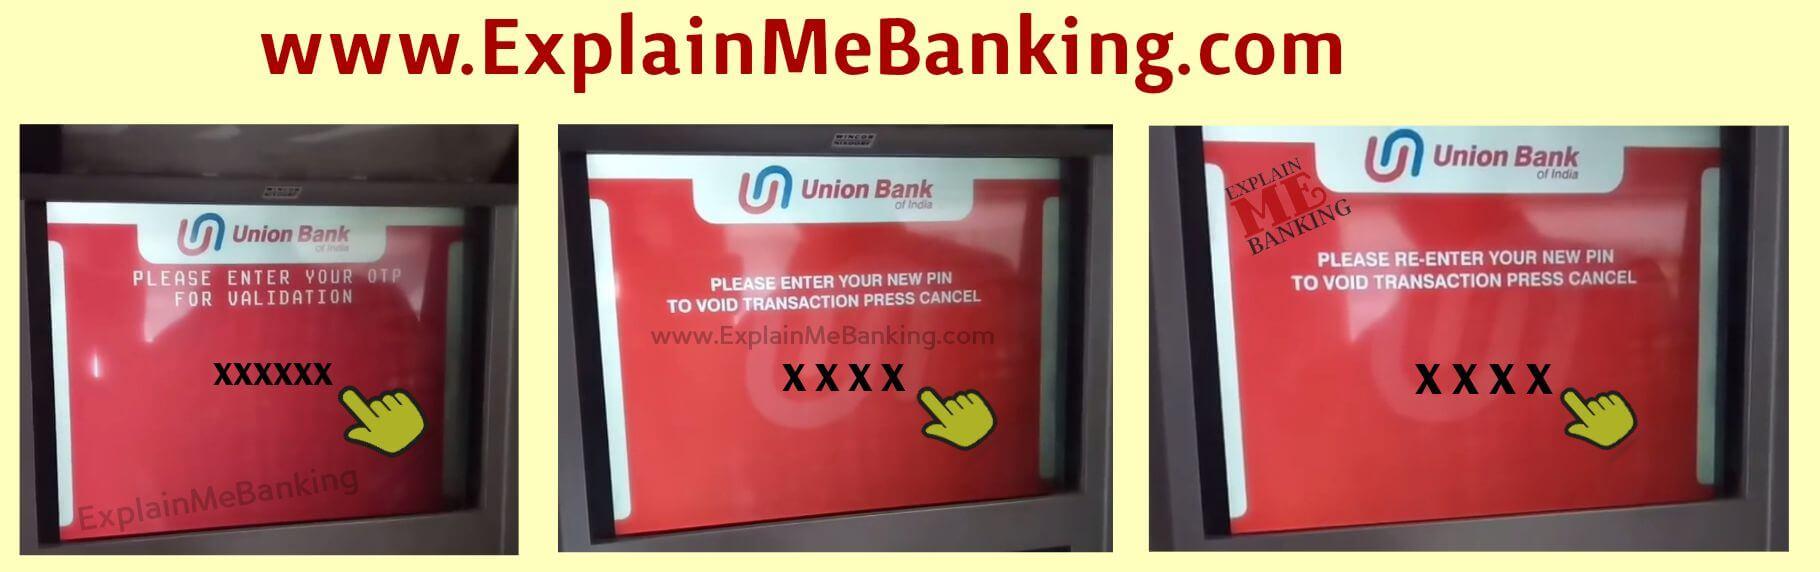 UBI Debit Card PIN Forgot